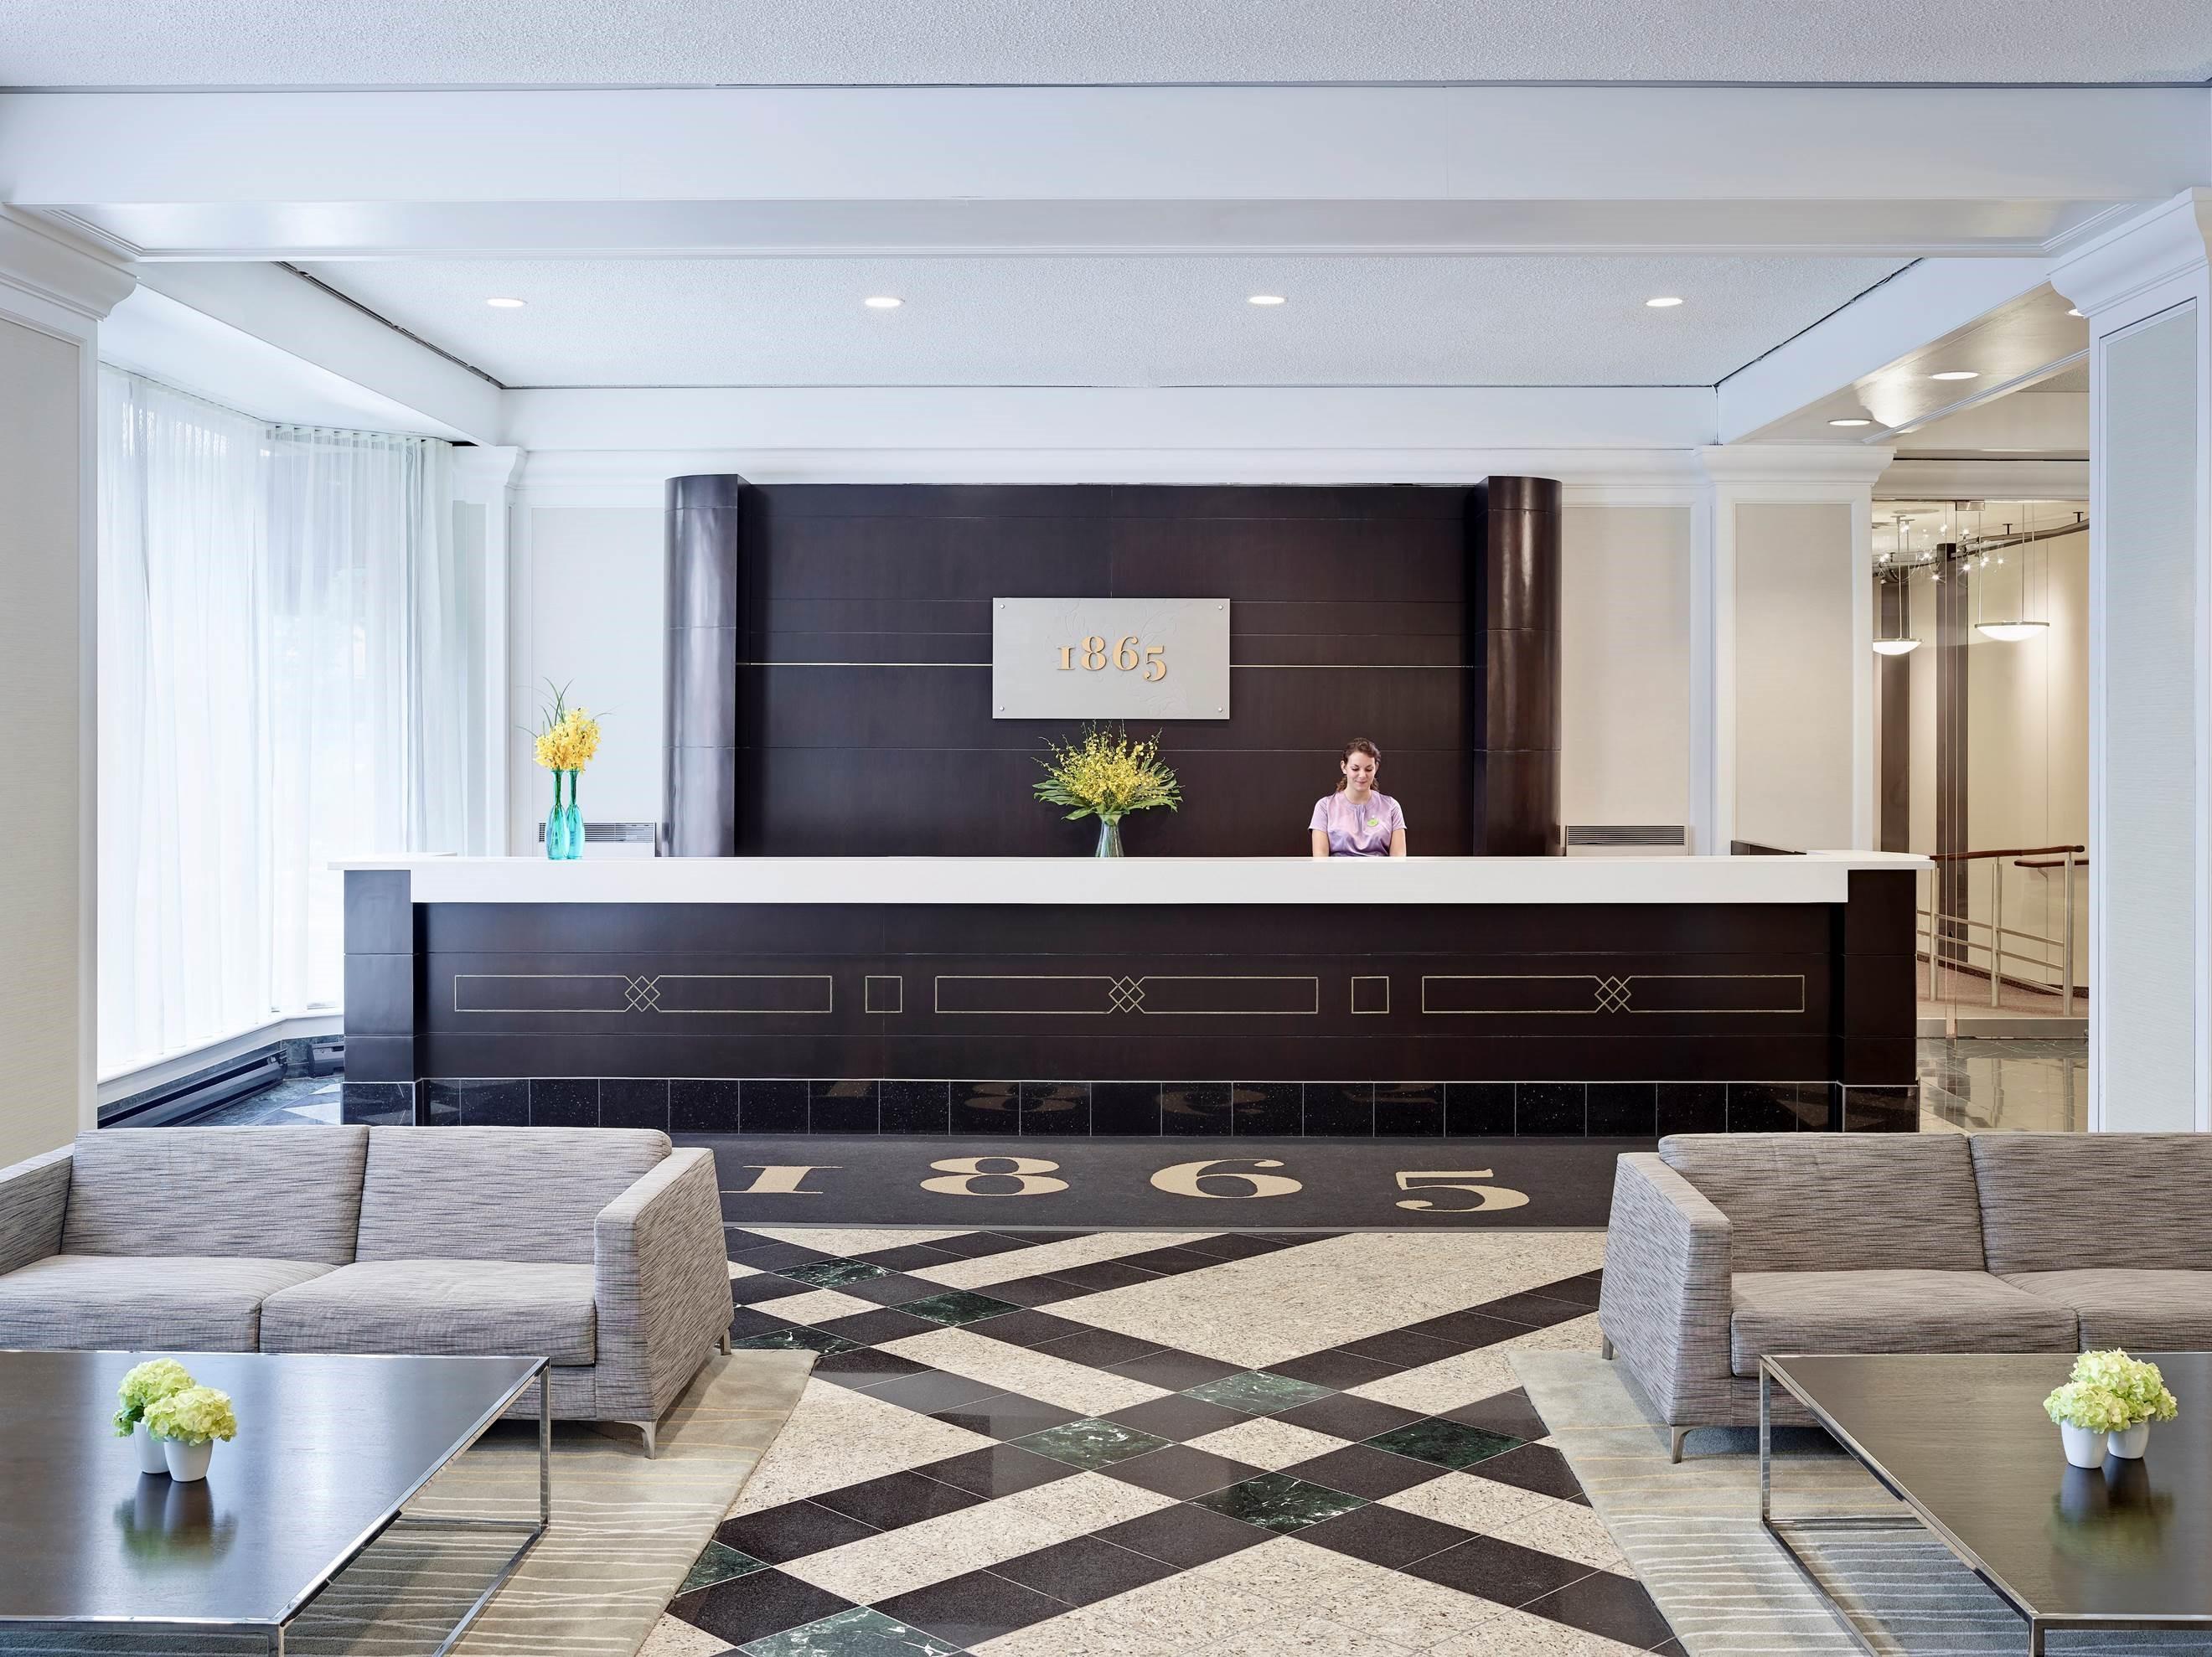 CHELSEA HOTEL, TORONTO in Toronto: 1865 Desk